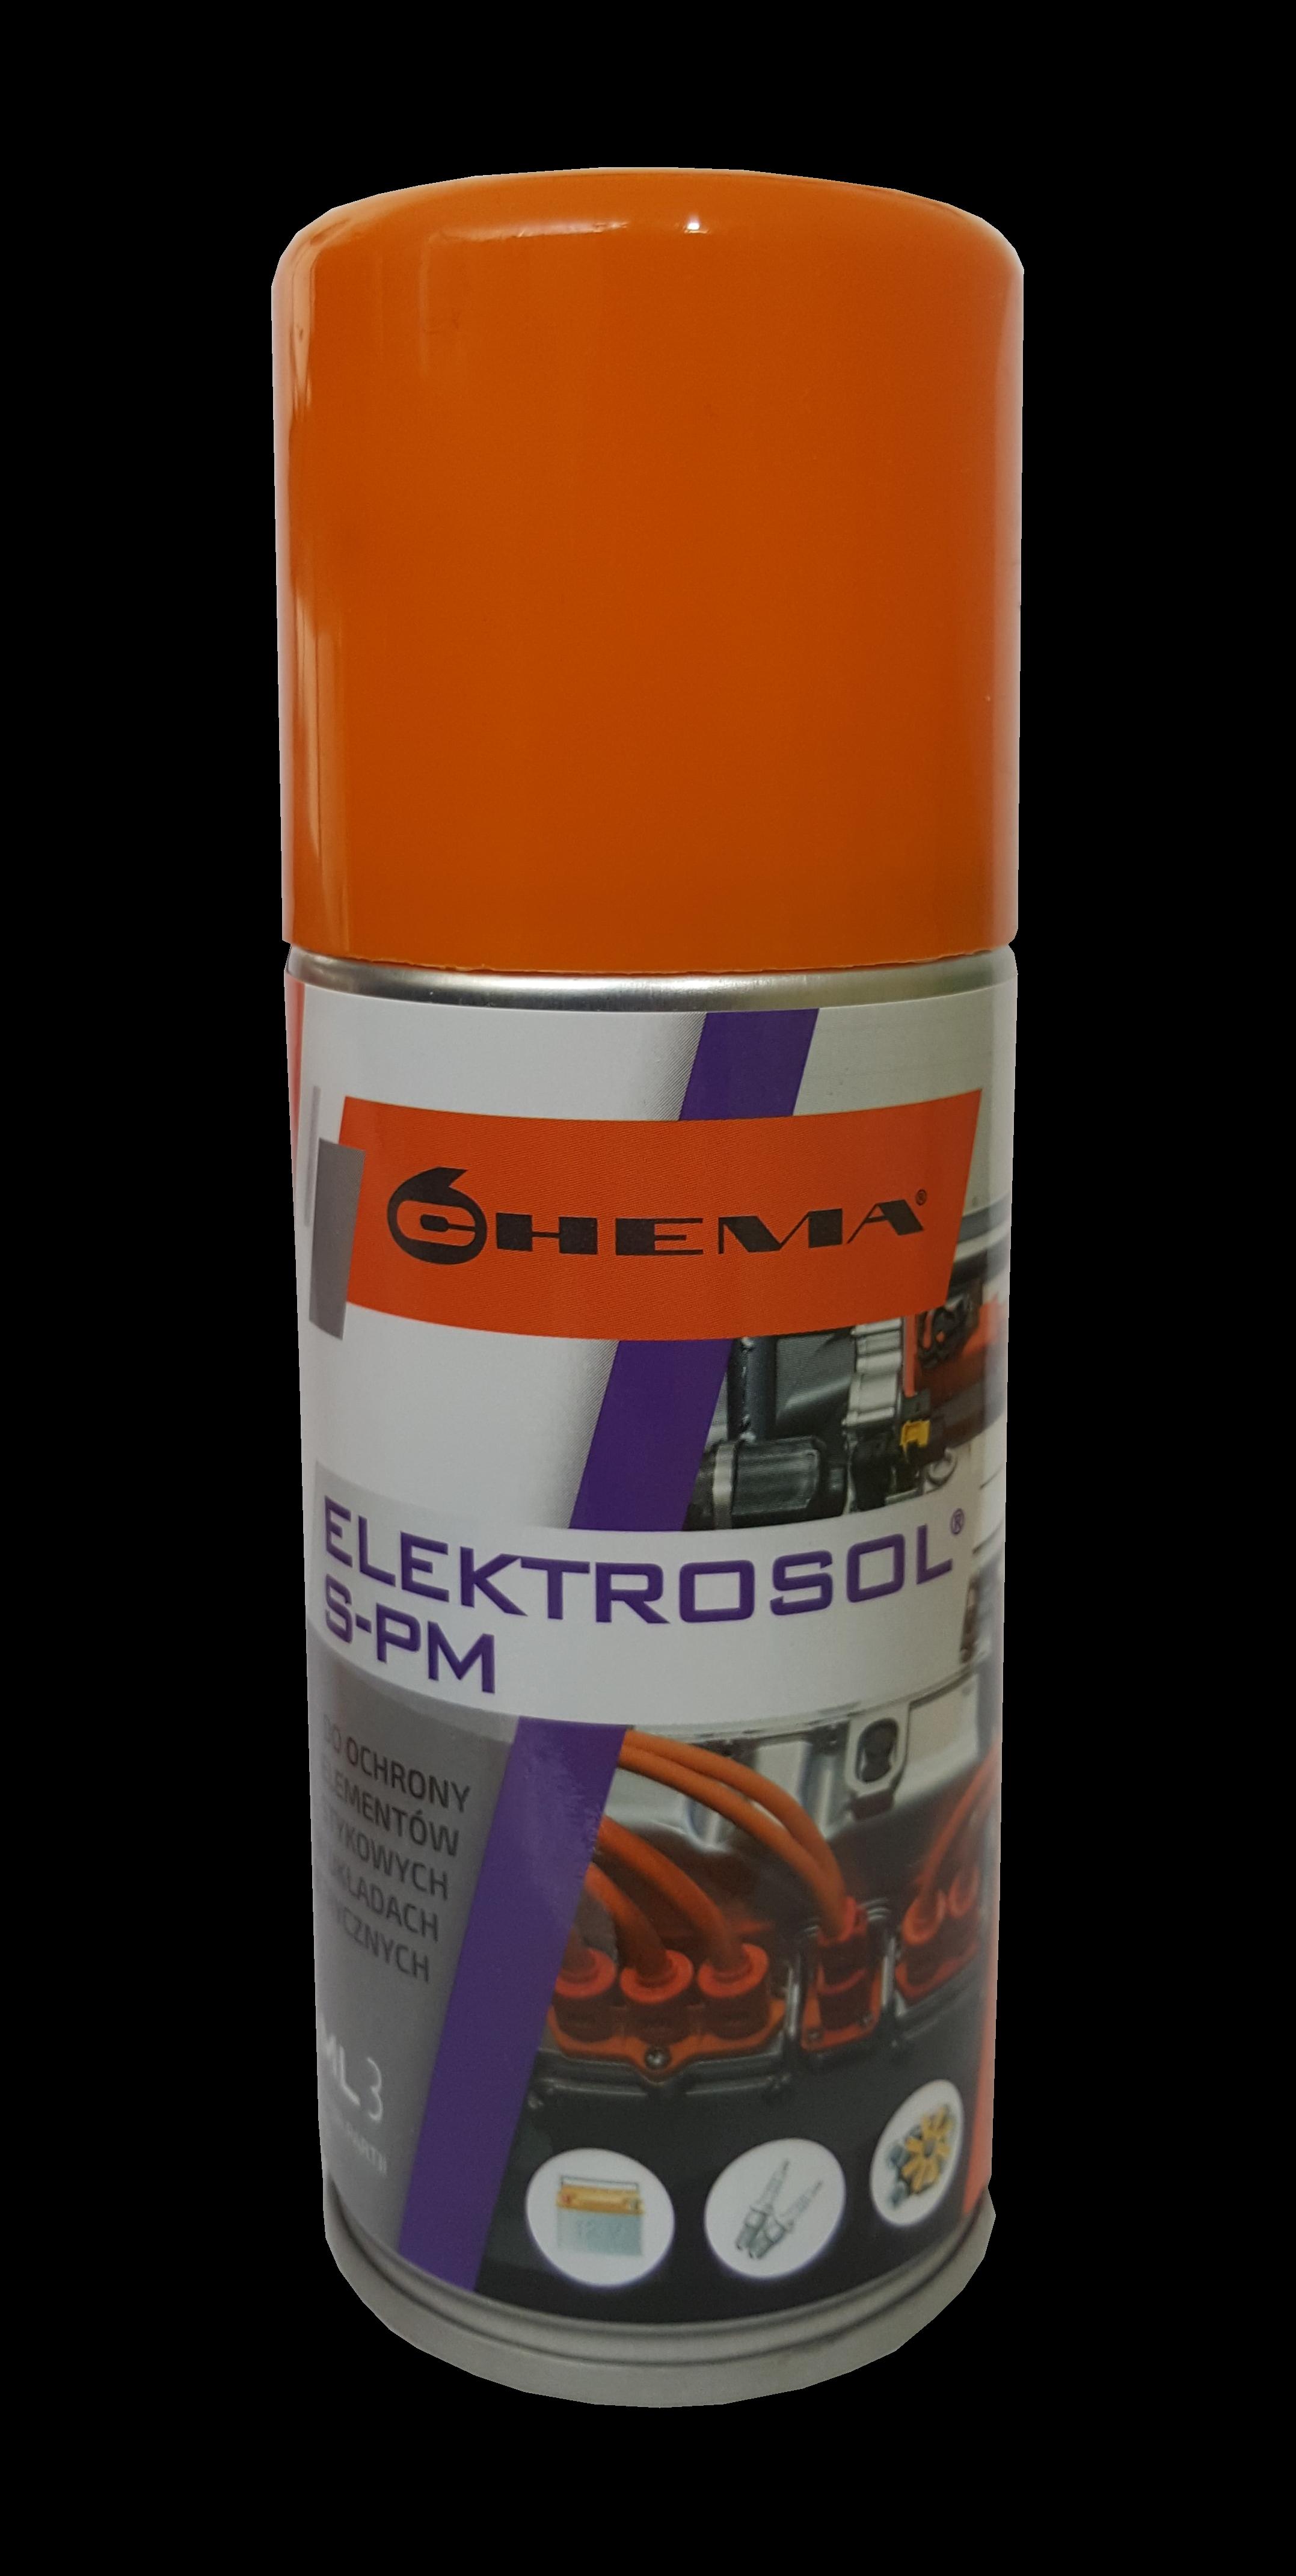 elektrosol radom